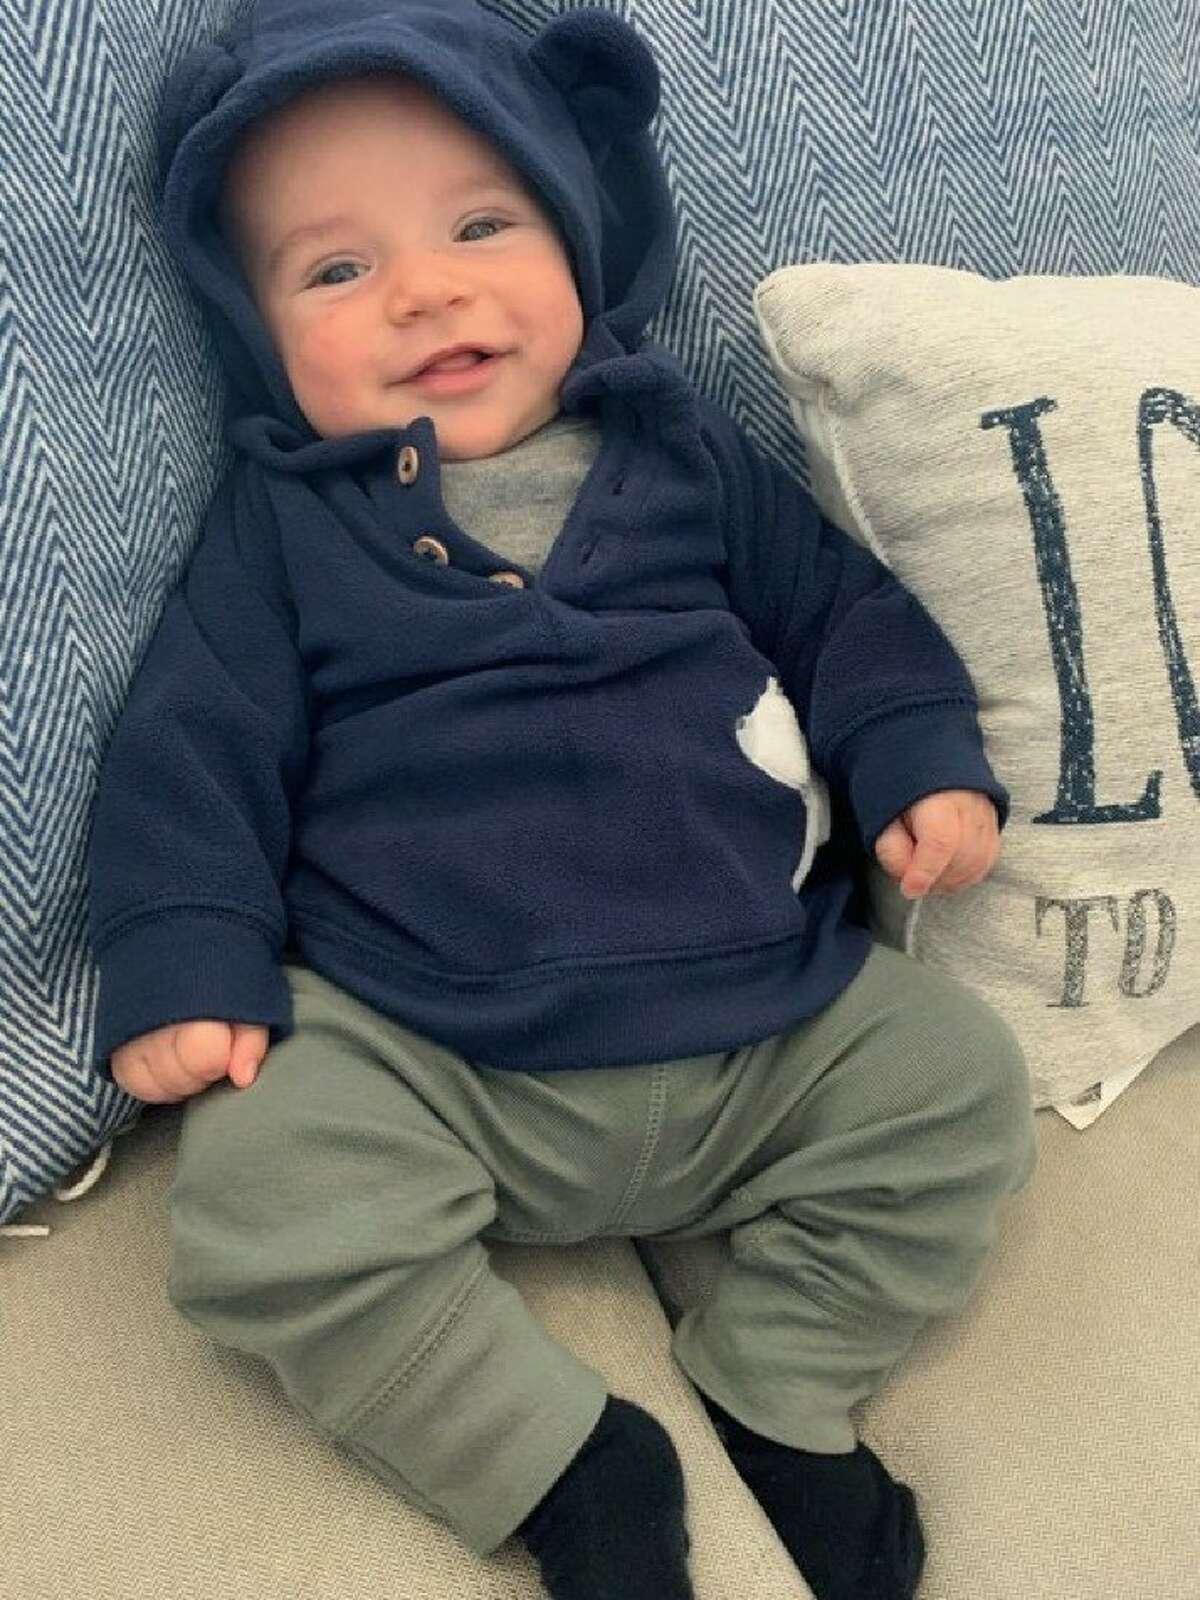 In September, News 4 San Antonio/Fox-29 meteorologist Greg Pollak welcomed his baby boy, Colton.